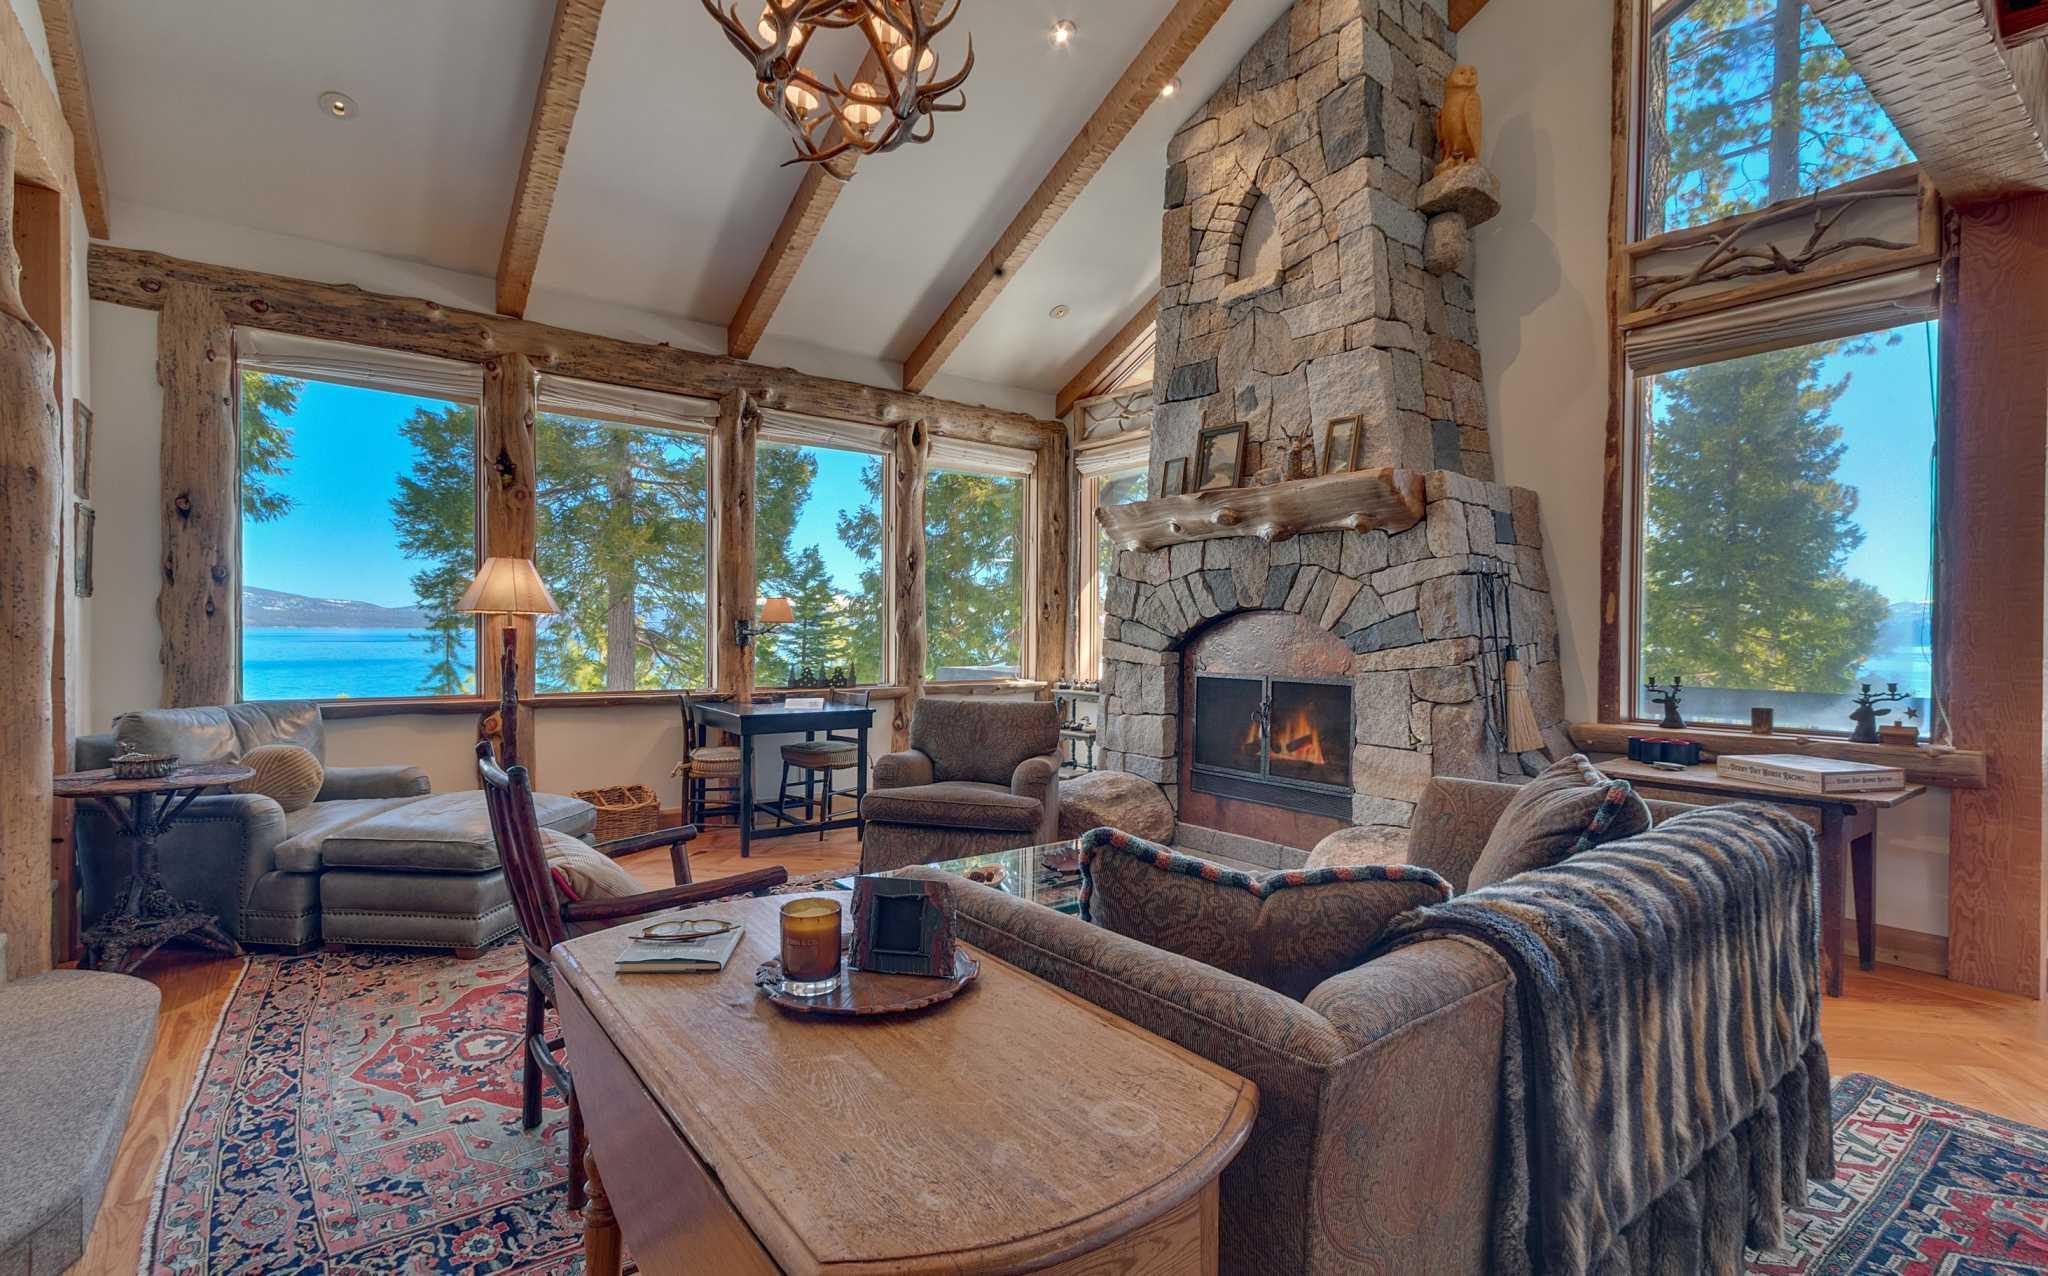 Getaway: Four-bedroom cabin in Chambers Landing overlooking Lake Tahoe